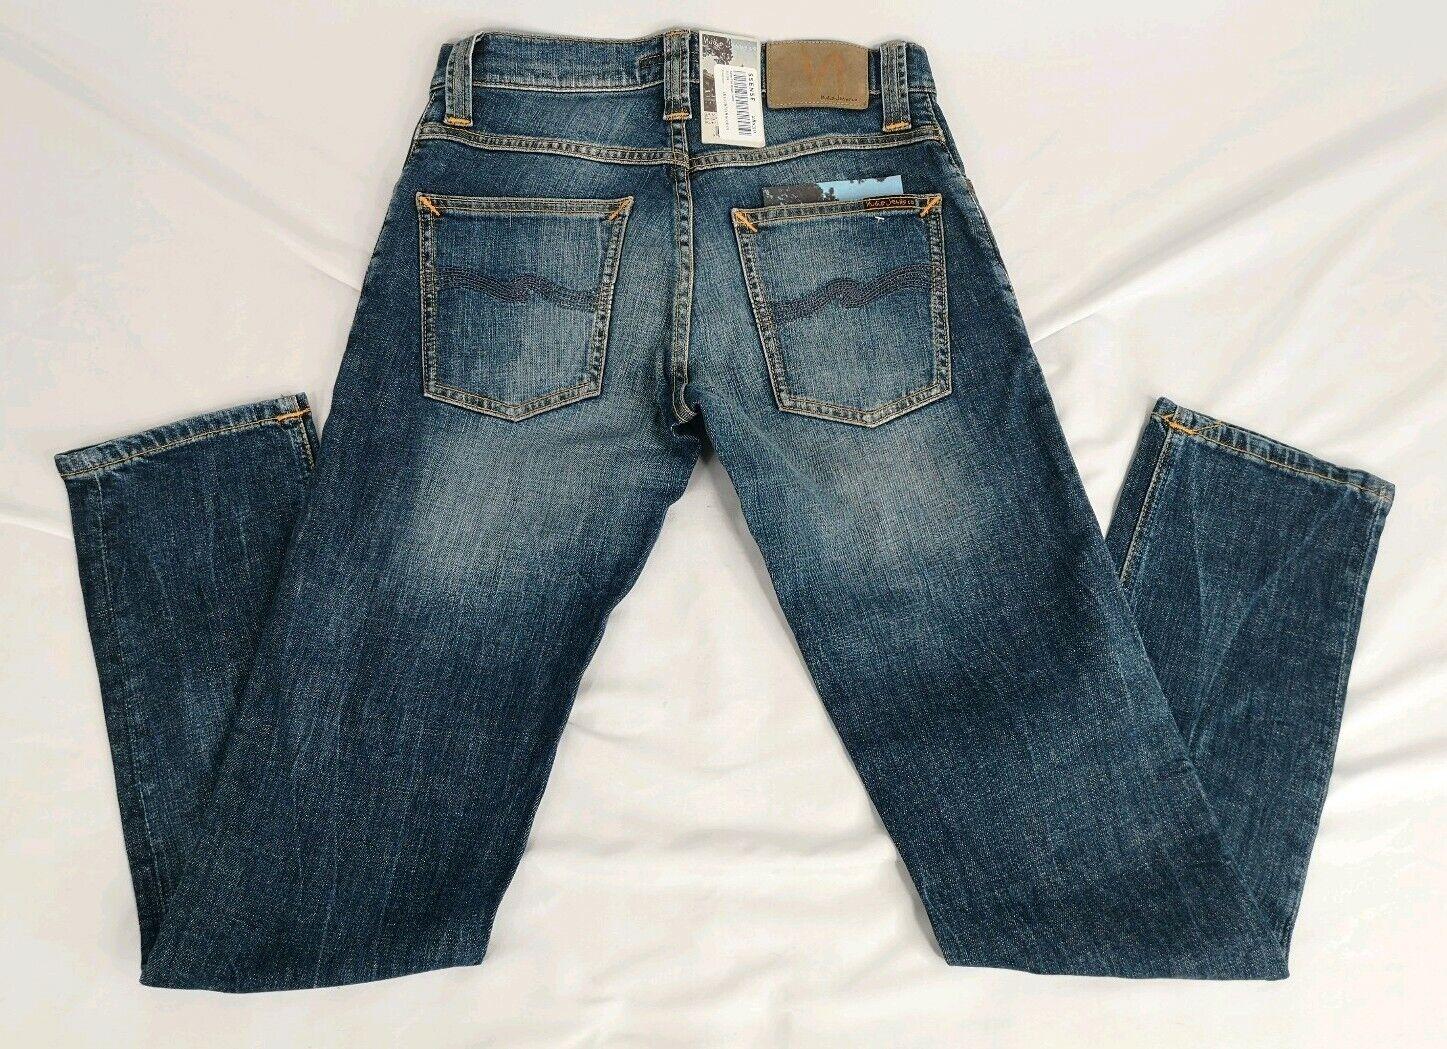 NEW Men's NUDIE Jeans Grim Tim Bright Dawn Size 28x30 Button Fly NWT Stretch